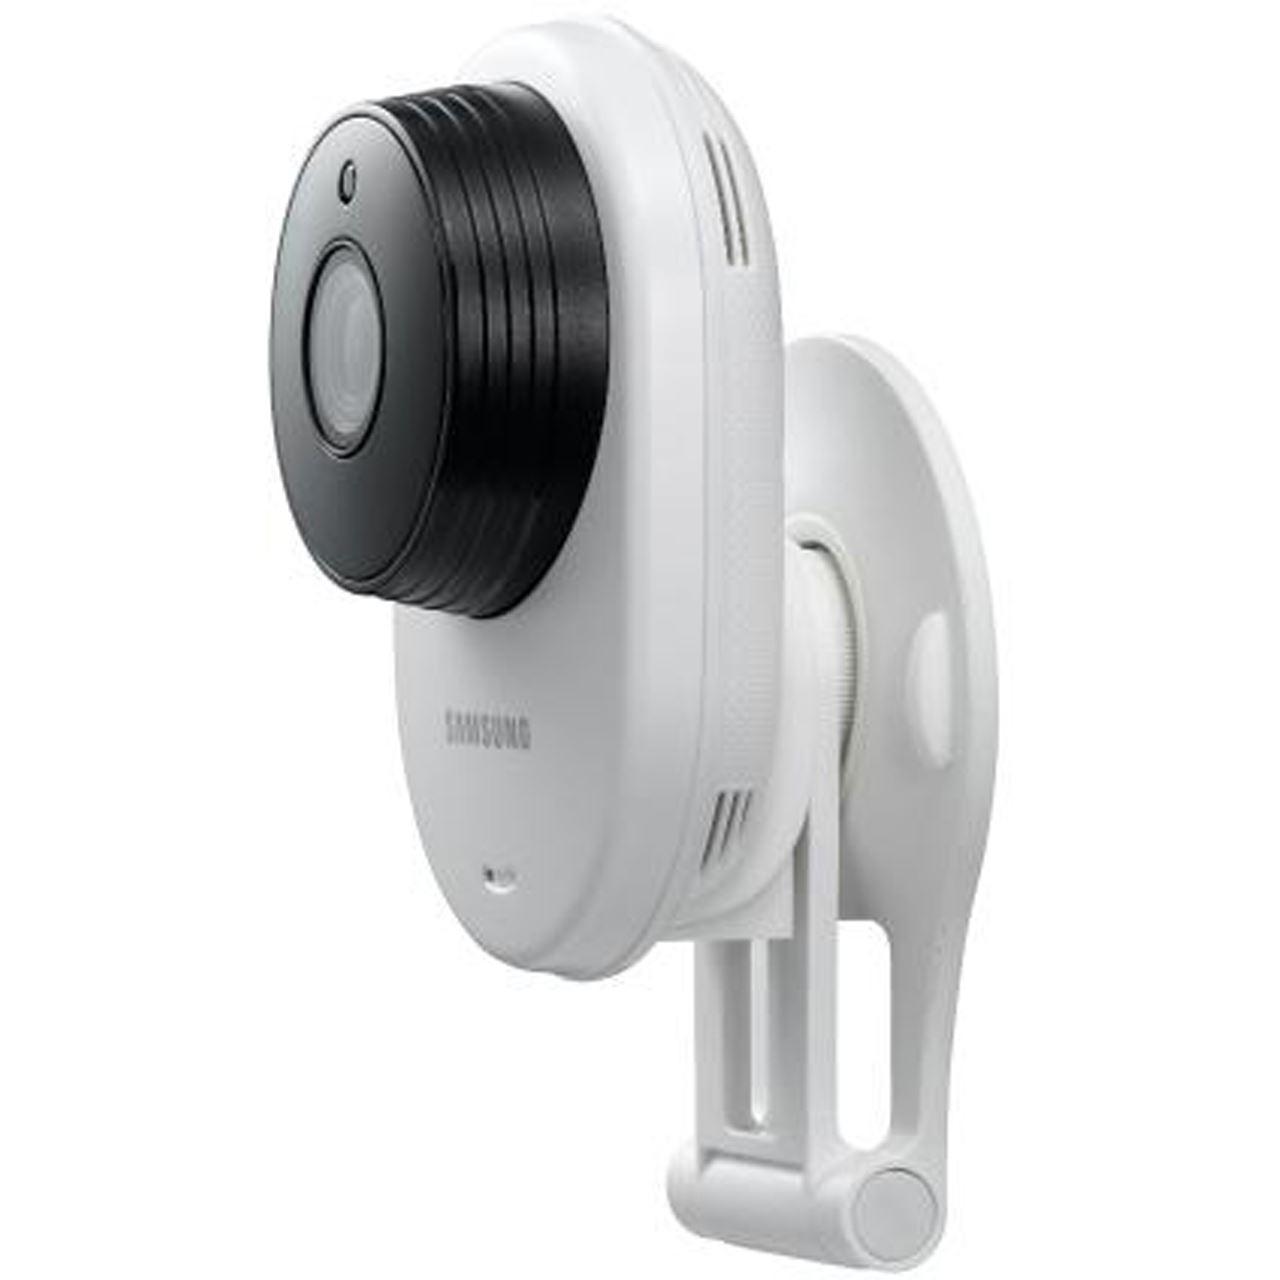 samsung smart home kamera hd wlan ohne wdr snh e6411bn zubeh r f r sicherheit. Black Bedroom Furniture Sets. Home Design Ideas